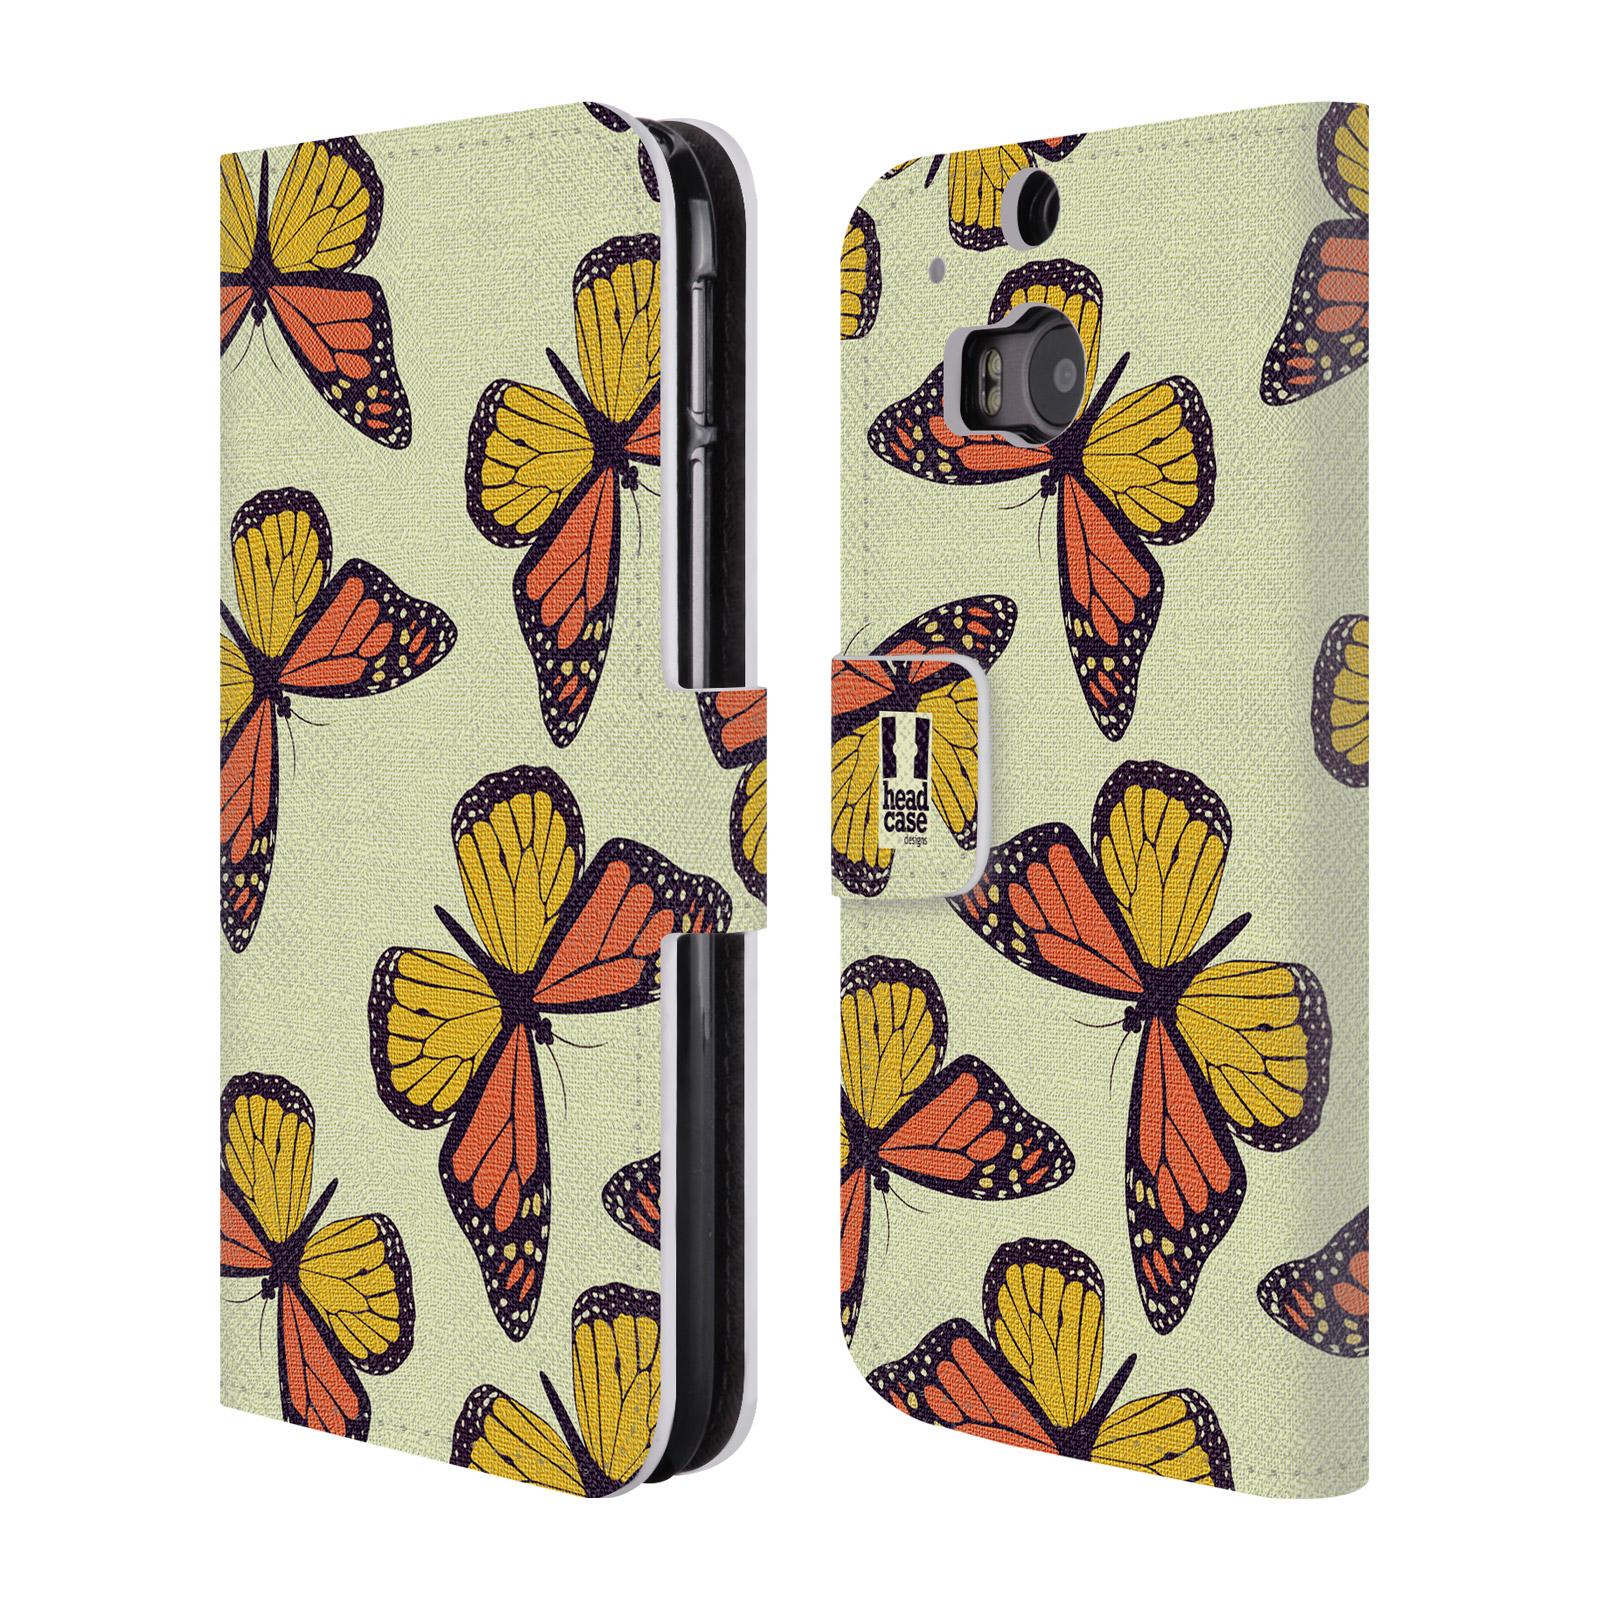 HEAD CASE Flipové pouzdro pro mobil HTC ONE (M8, M8s) Vzorkovaný motýl Monarcha oranžová